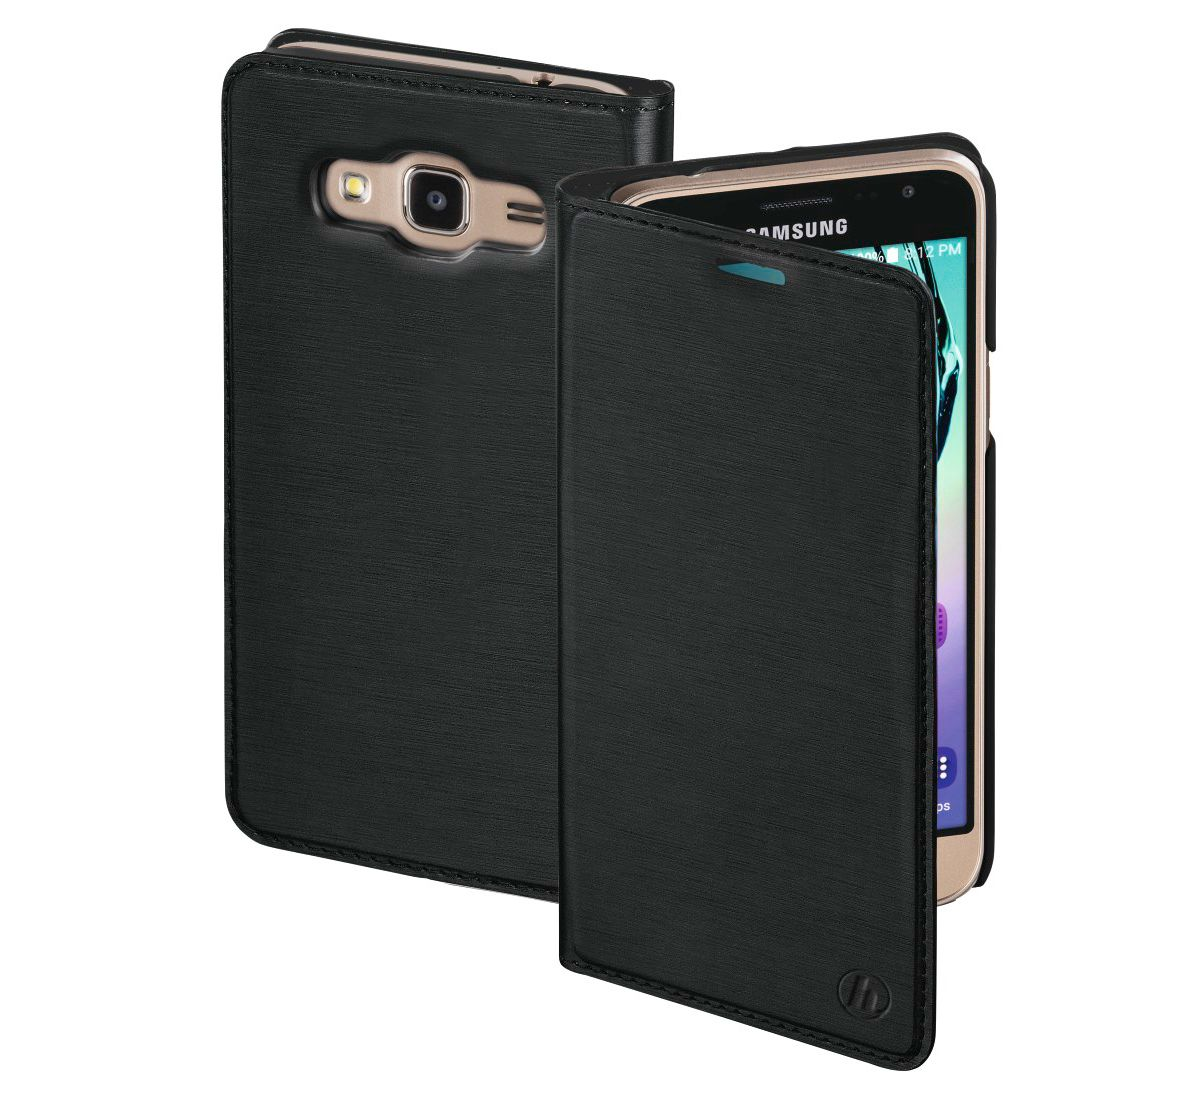 454ee2c64e625 Hama Booklet Slim für Samsung Galaxy J3 (2016)